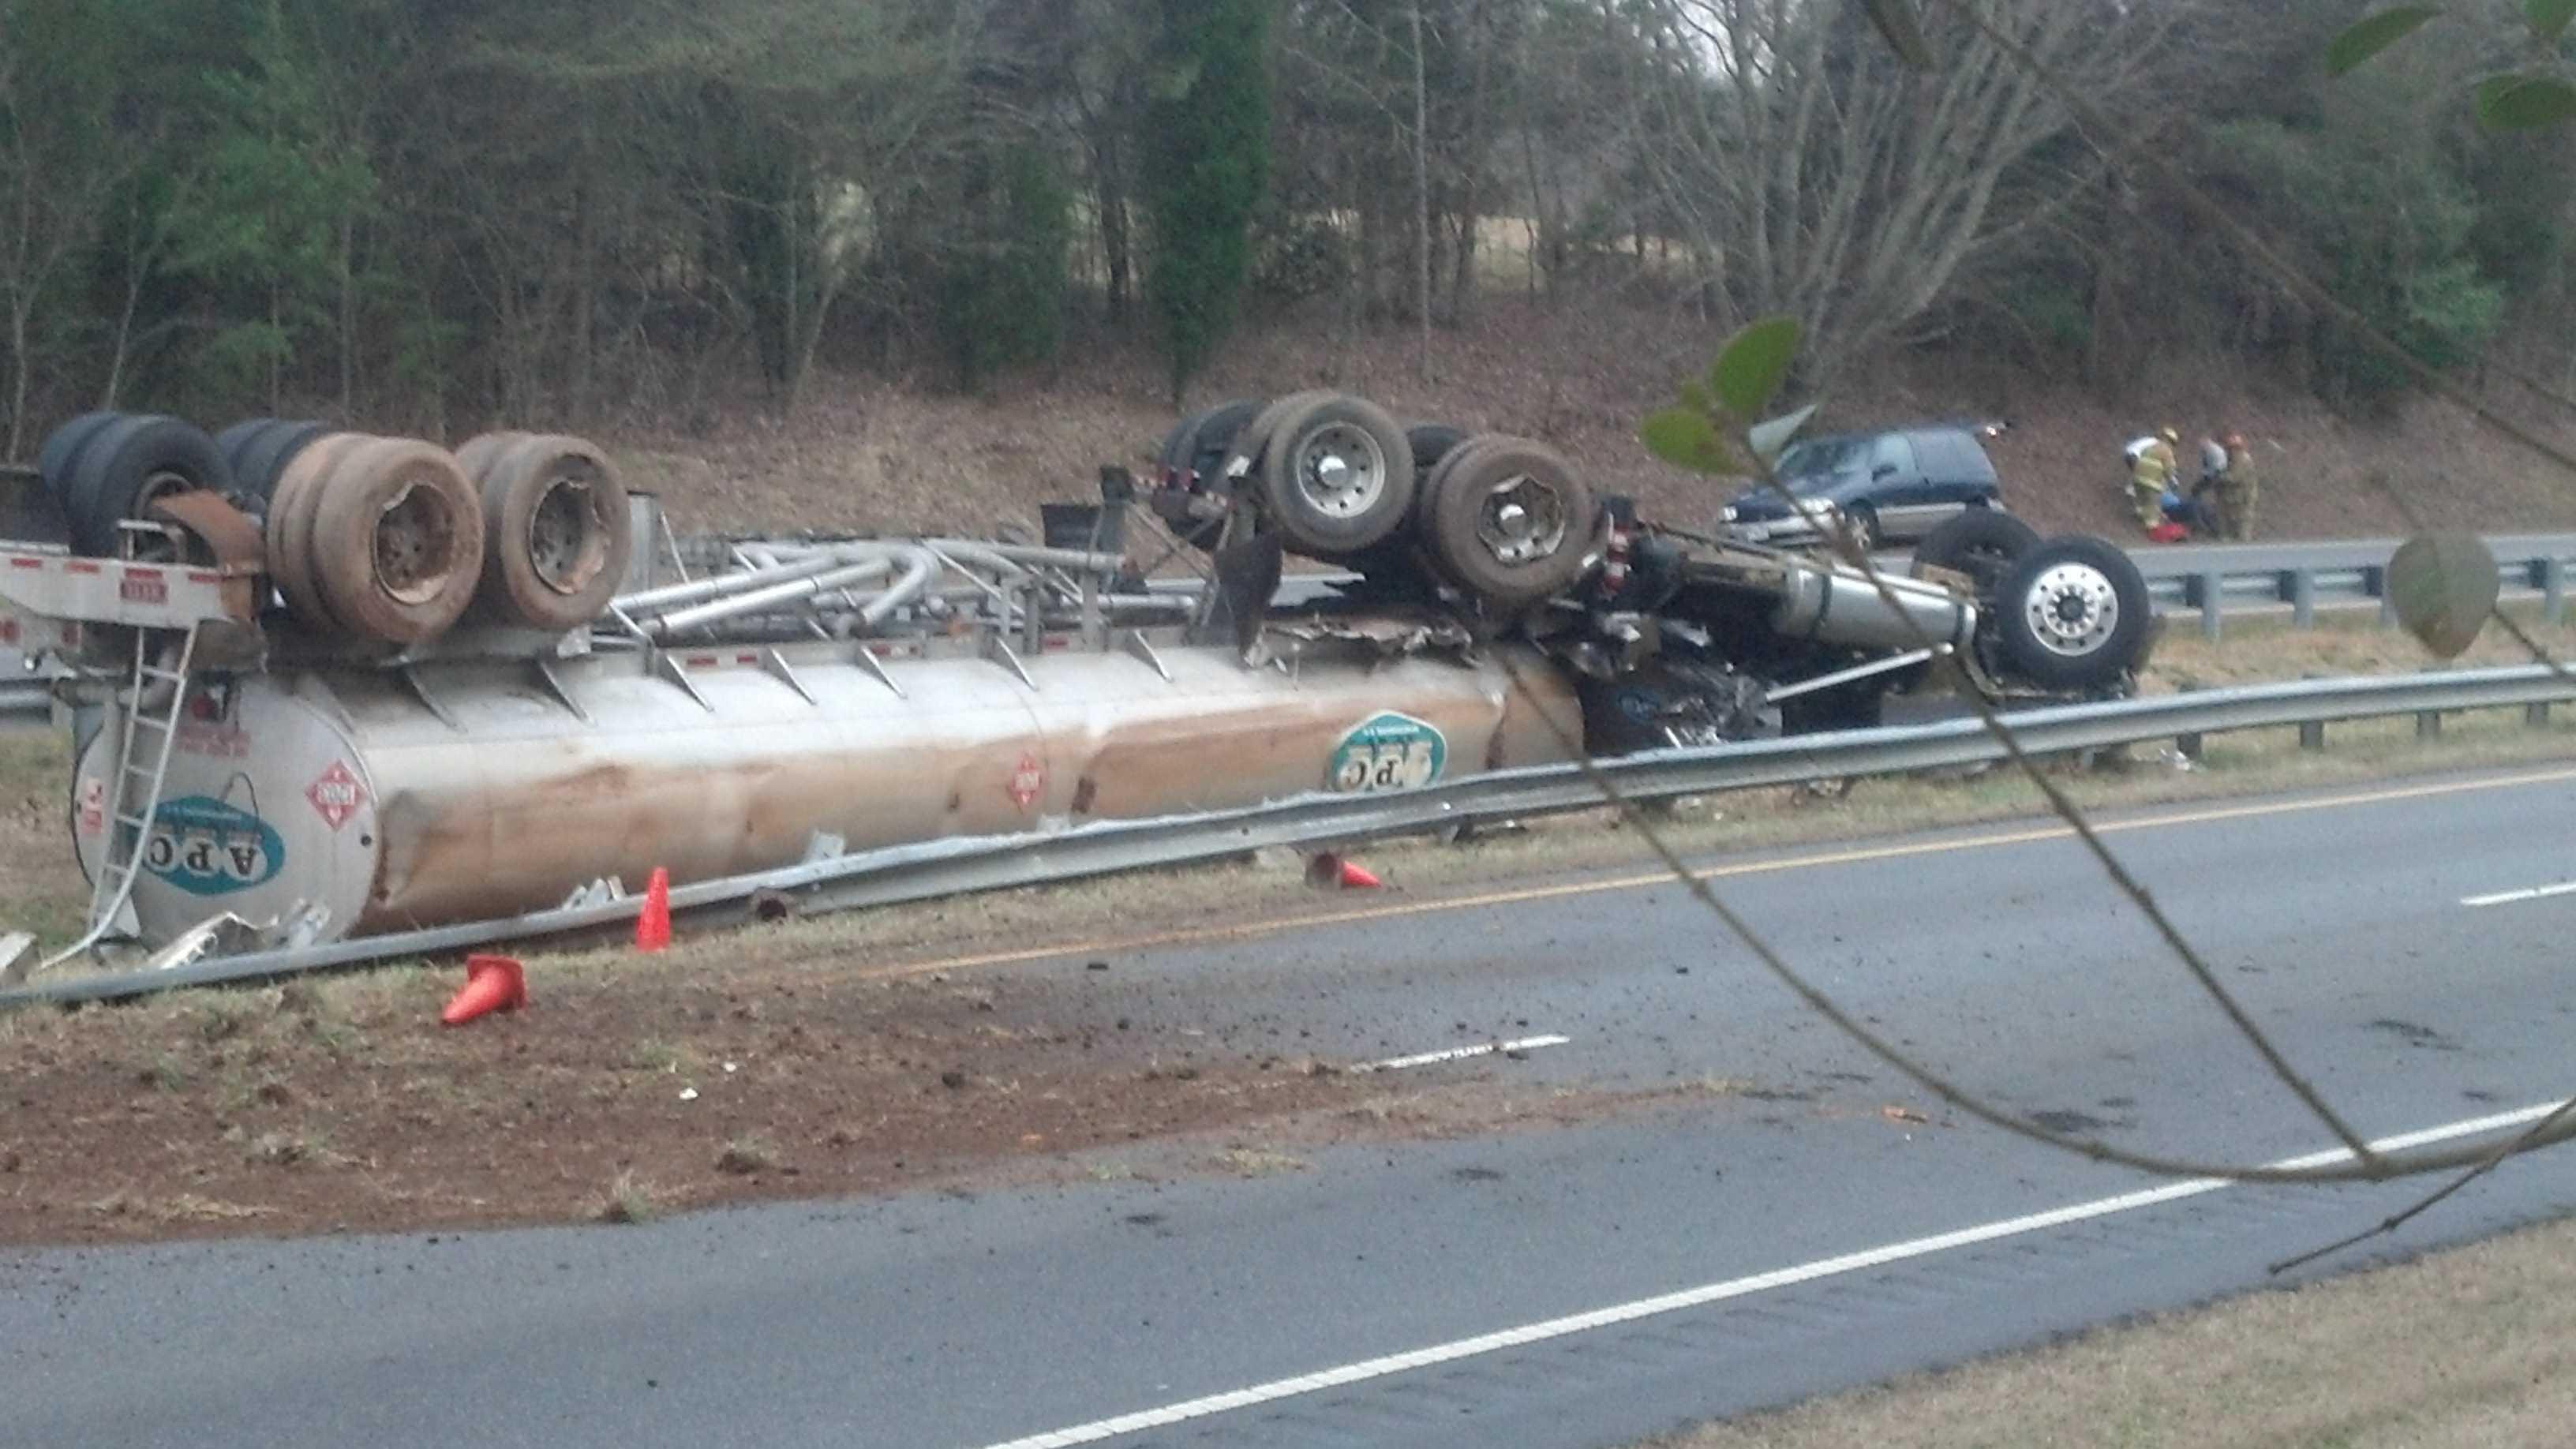 Tanker truck crashes on U.S. 421